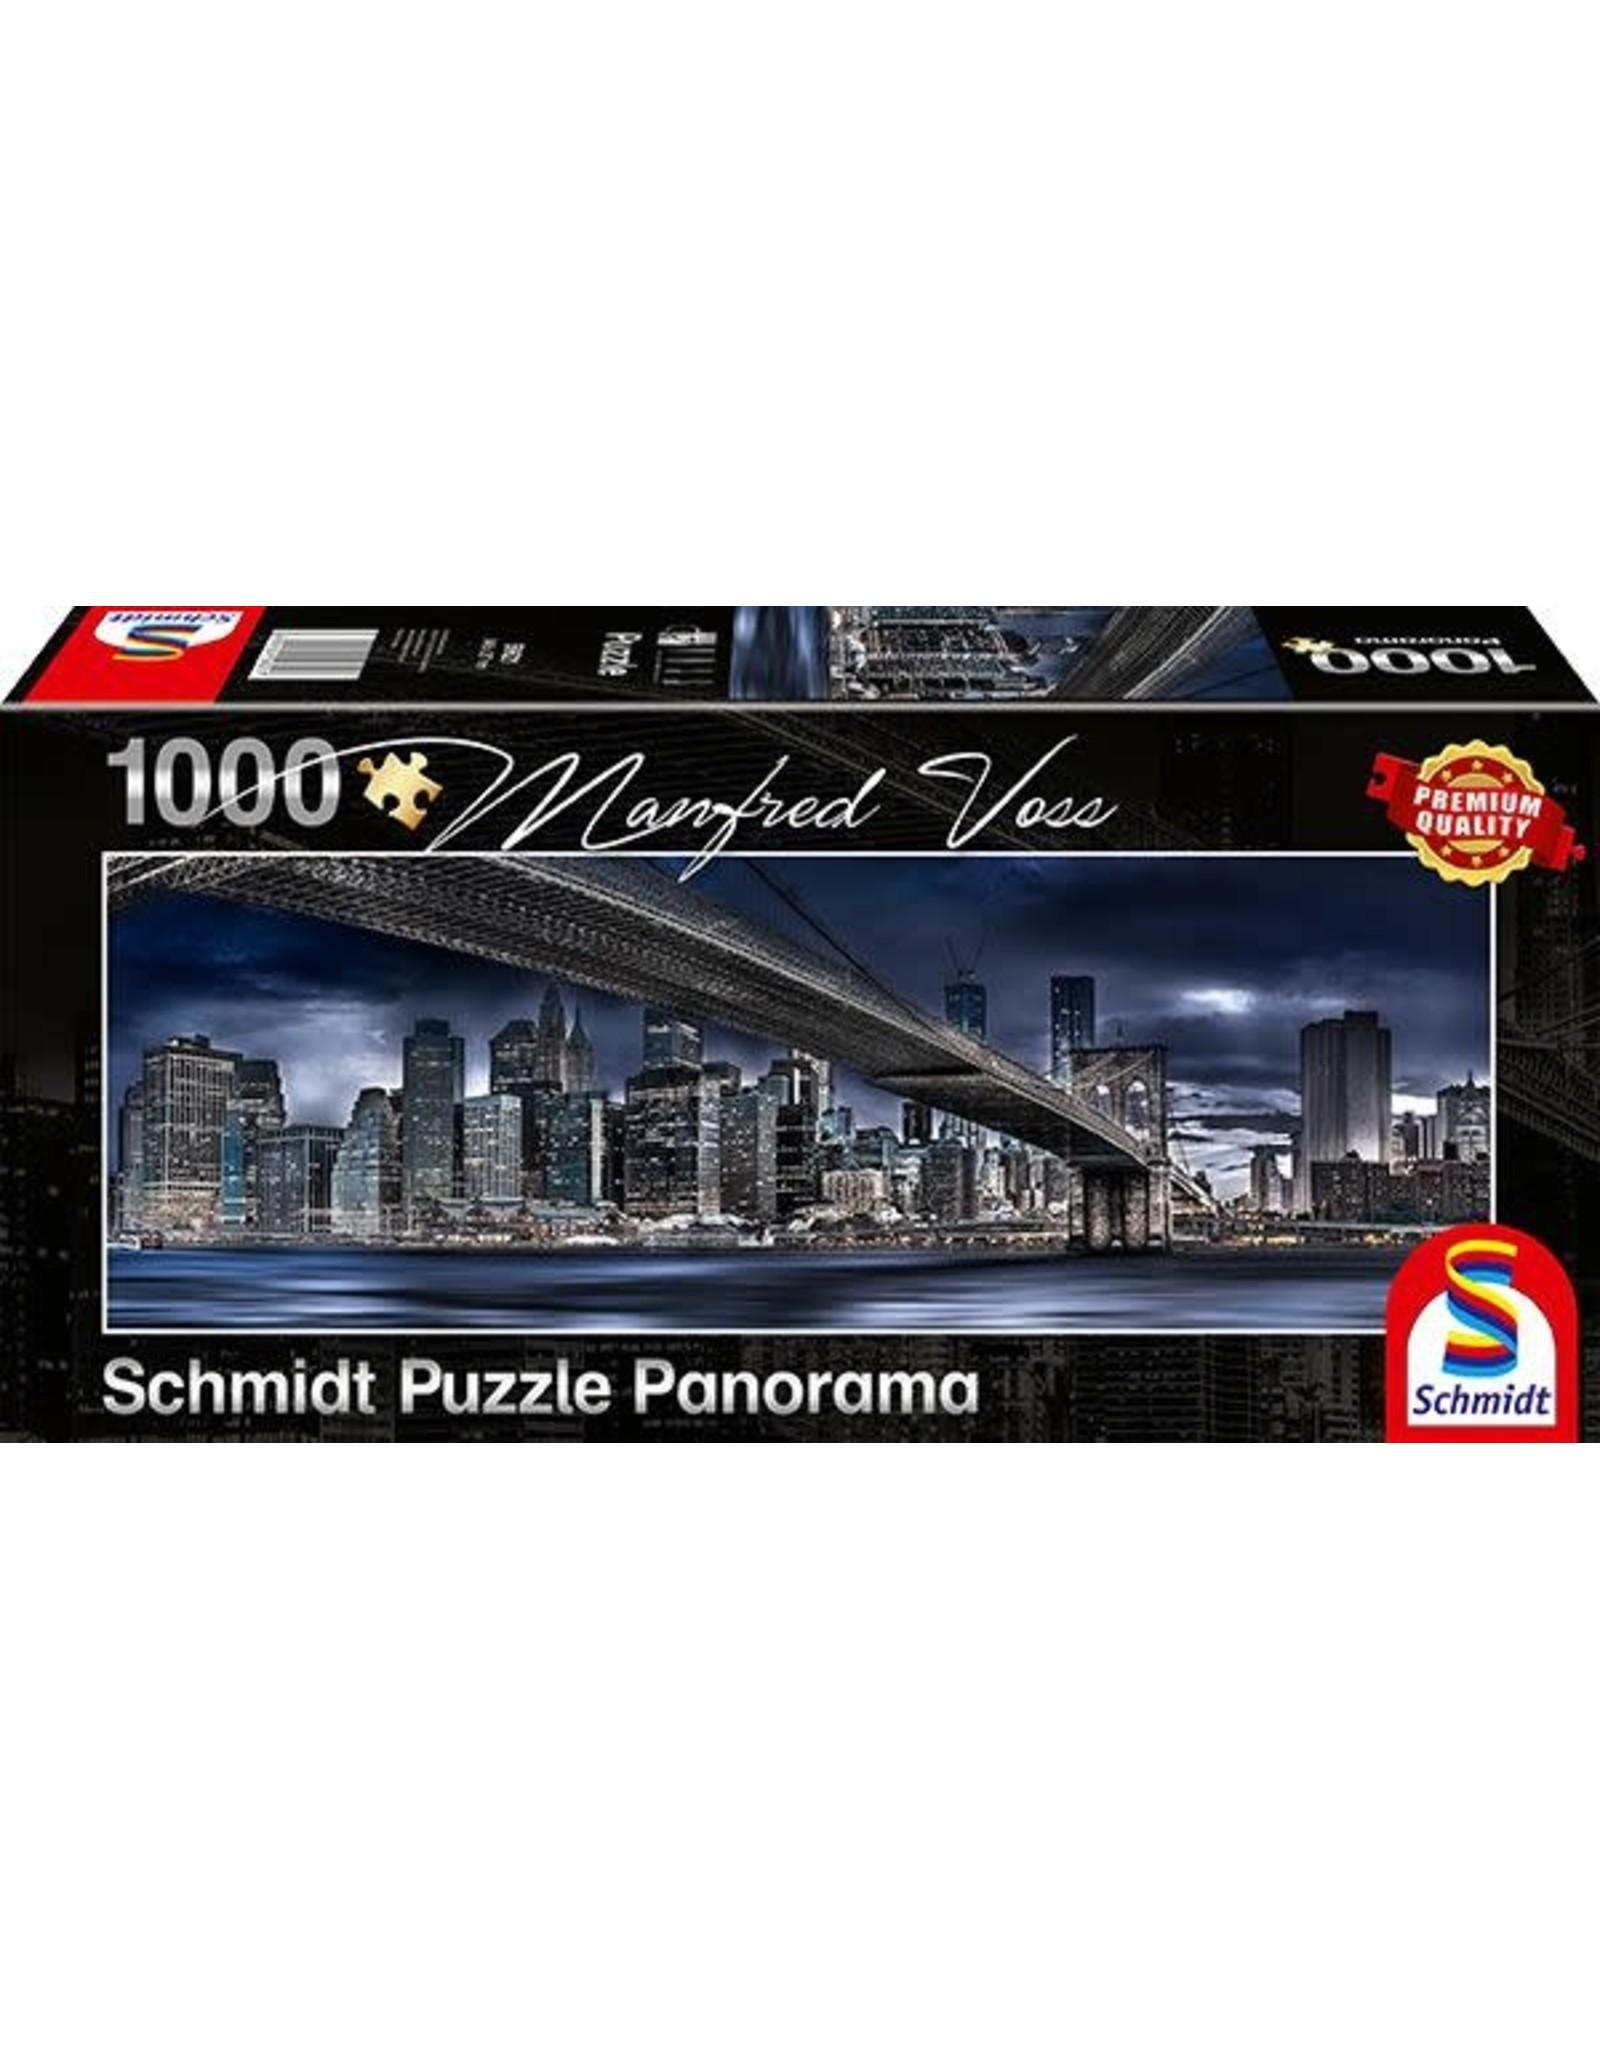 Schmidt New York Dark Night 1000pc Panorama Puzzle